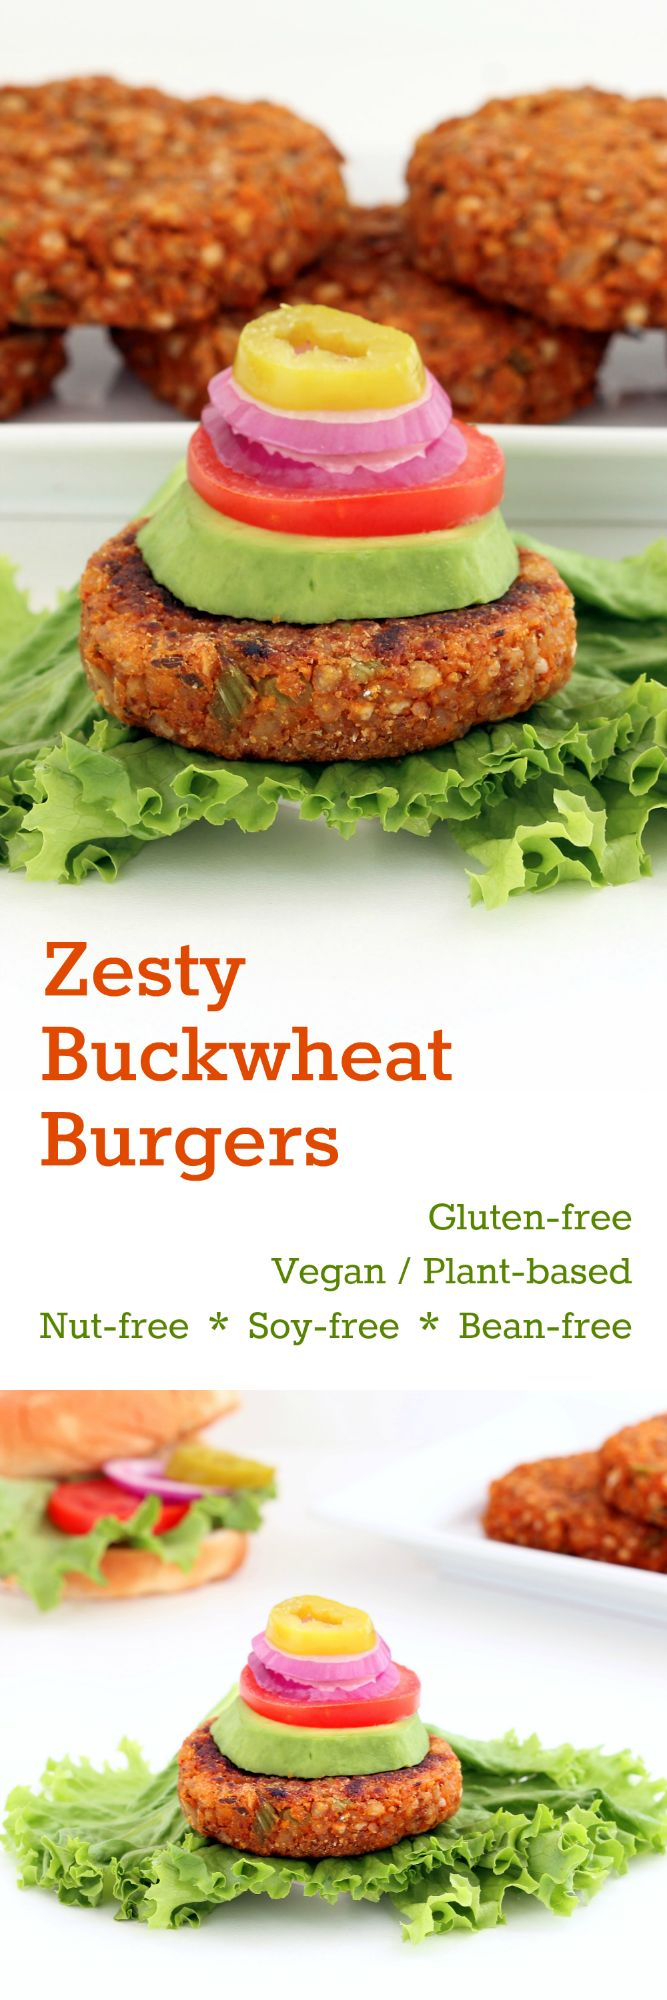 Zesty Buckwheat Burgers - vegan and gluten-free